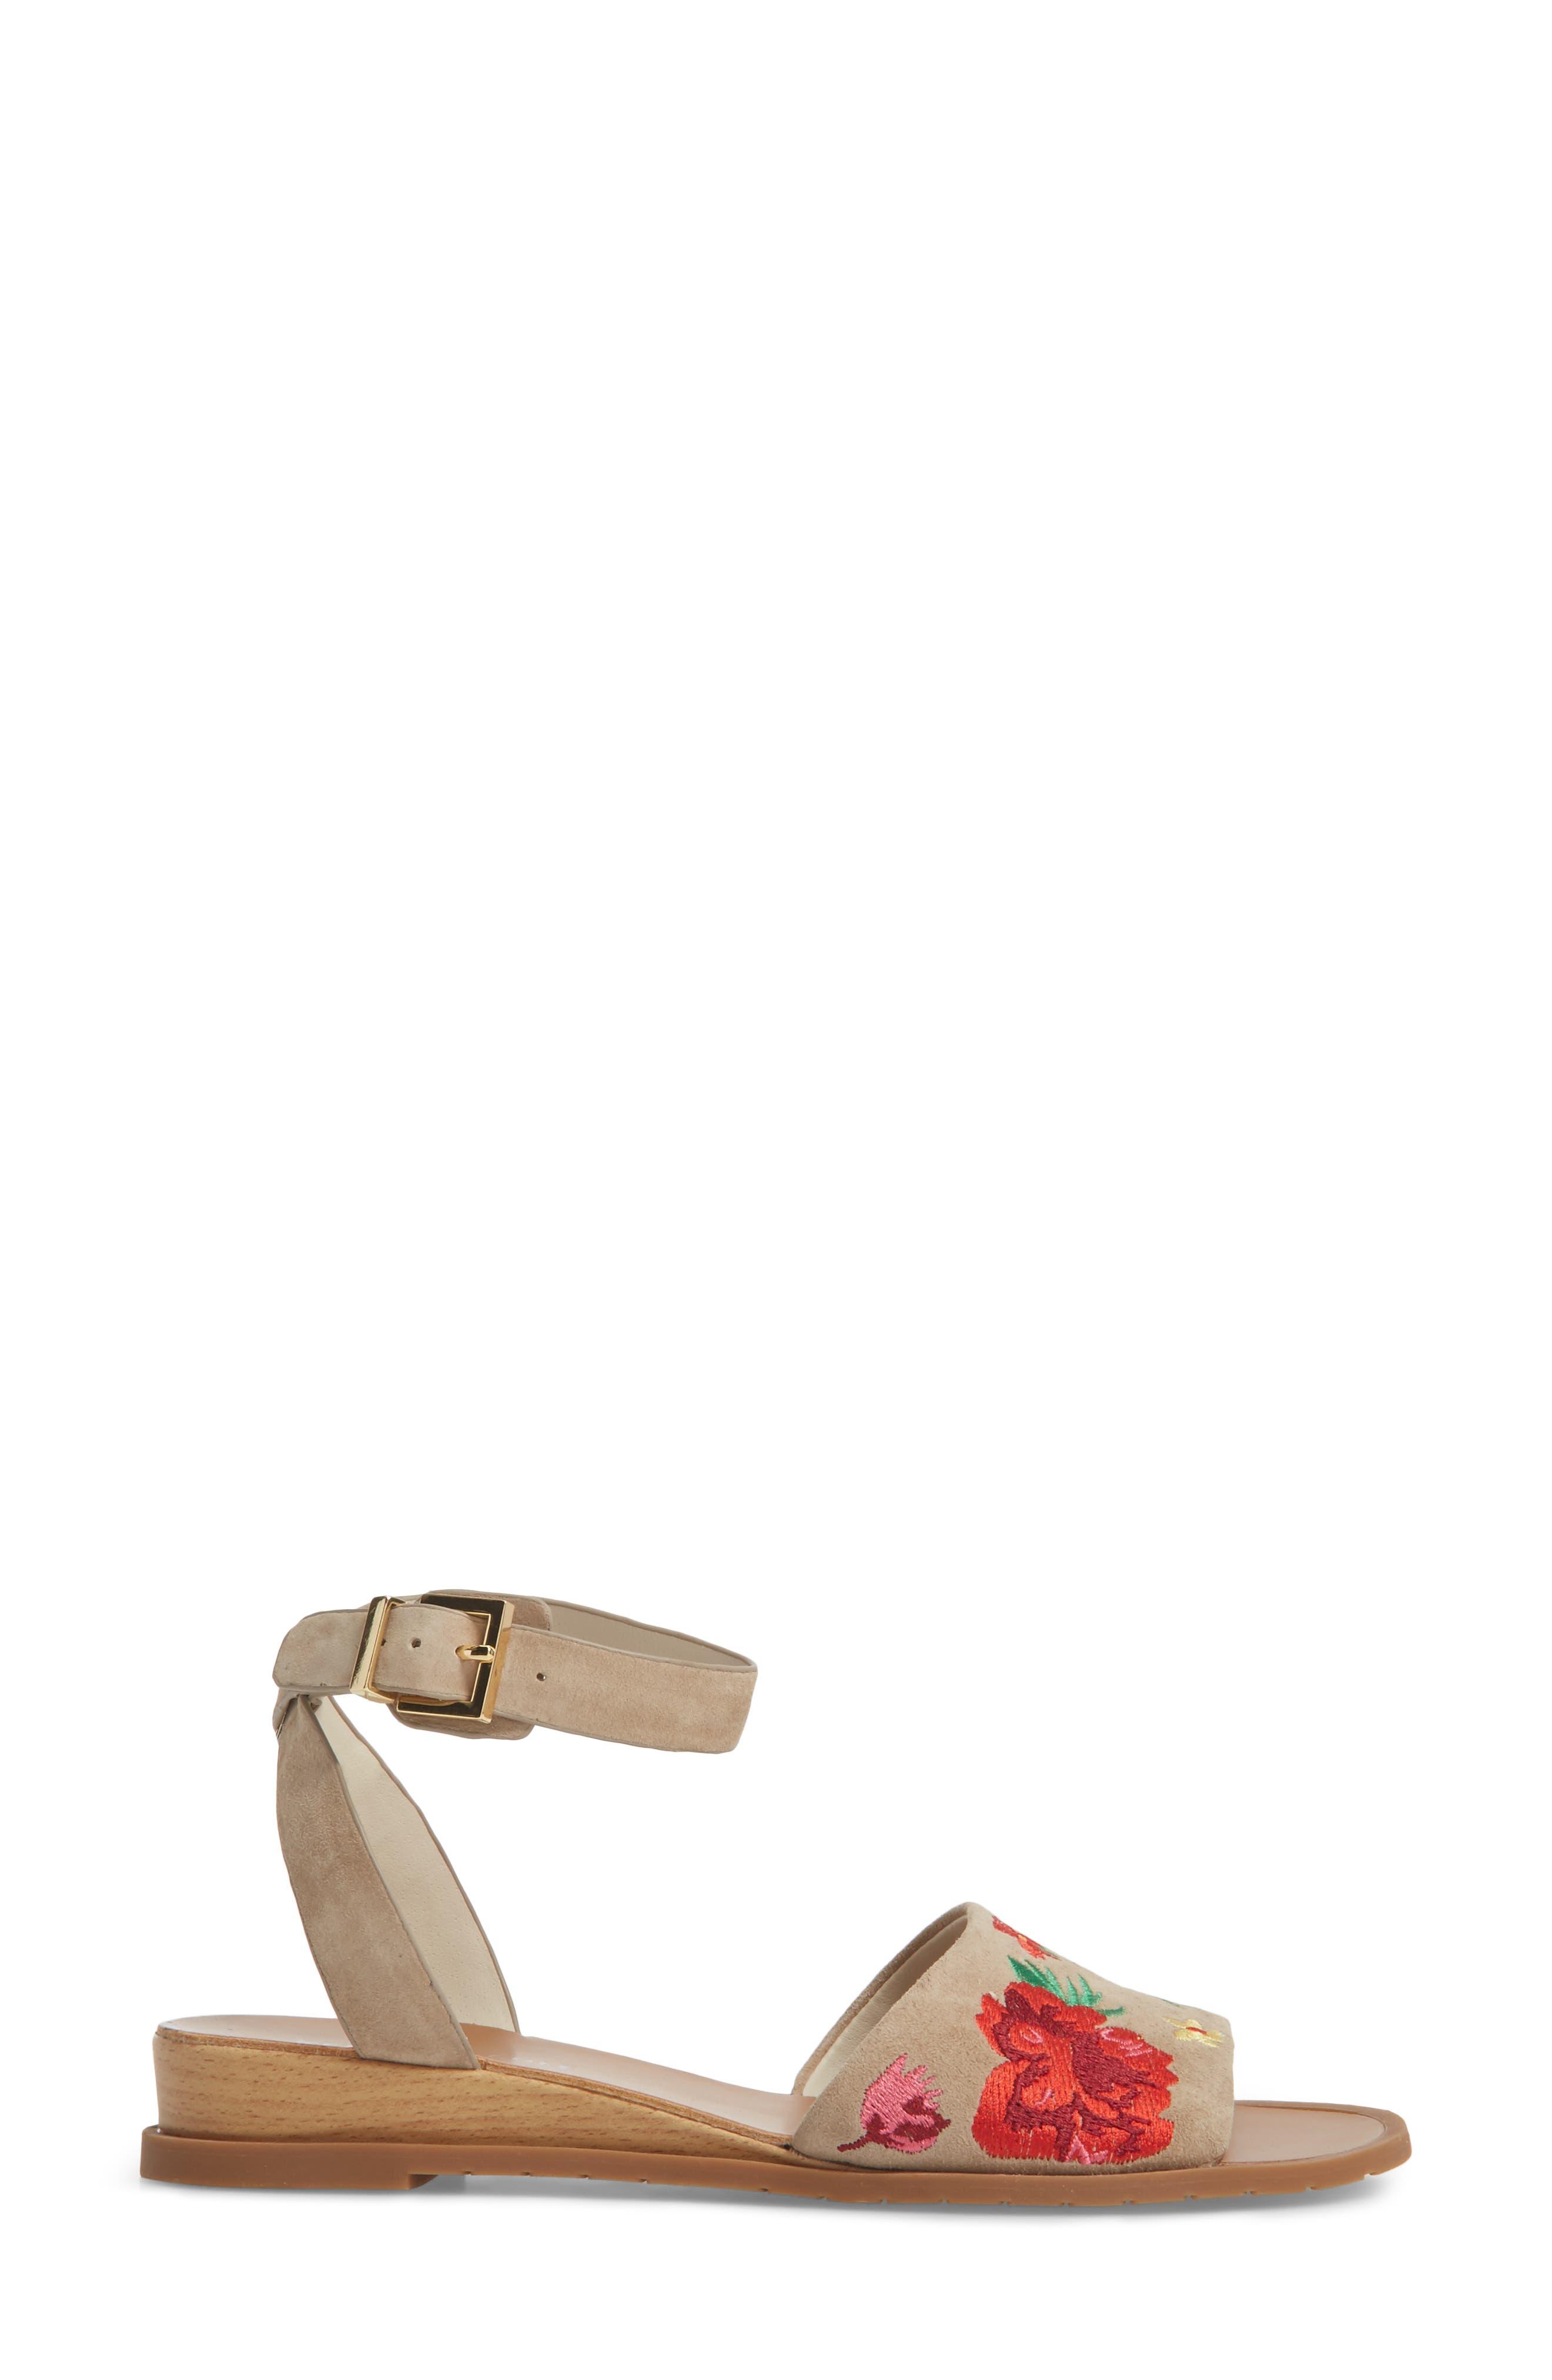 Jinny Ankle Strap Sandal,                             Alternate thumbnail 3, color,                             250